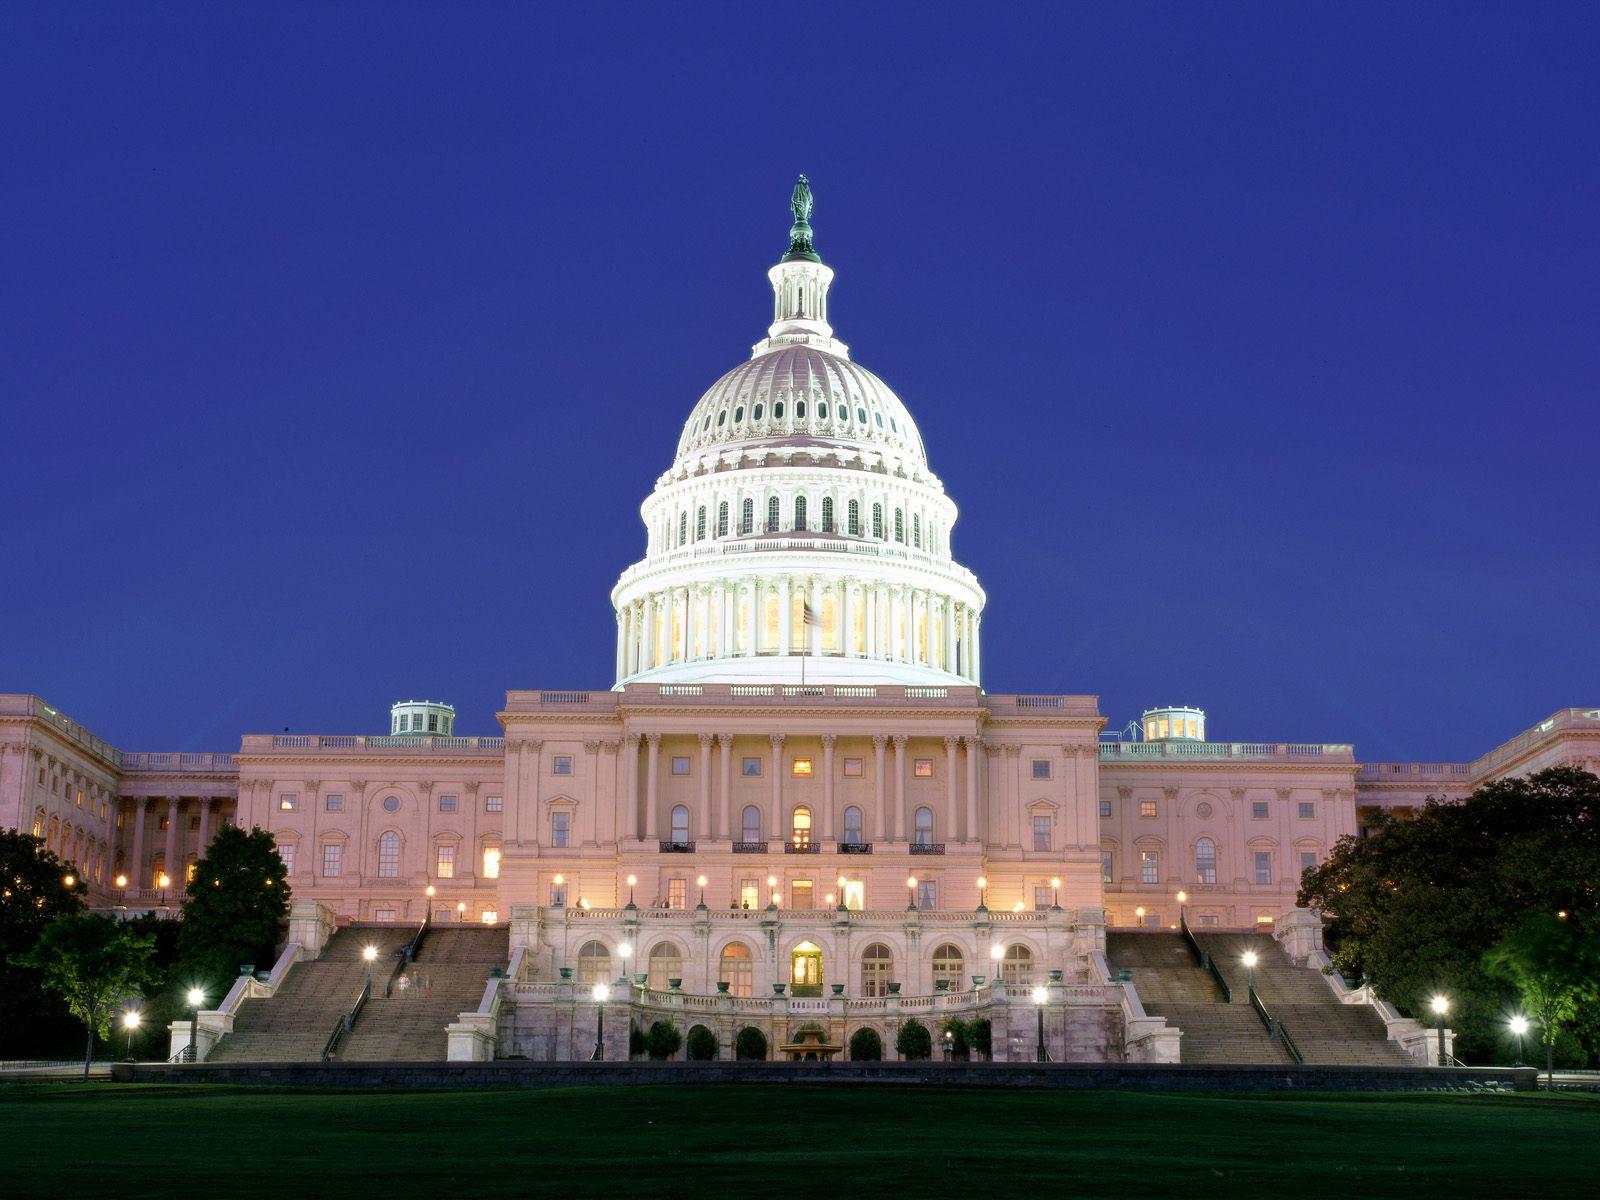 Washington Pictures